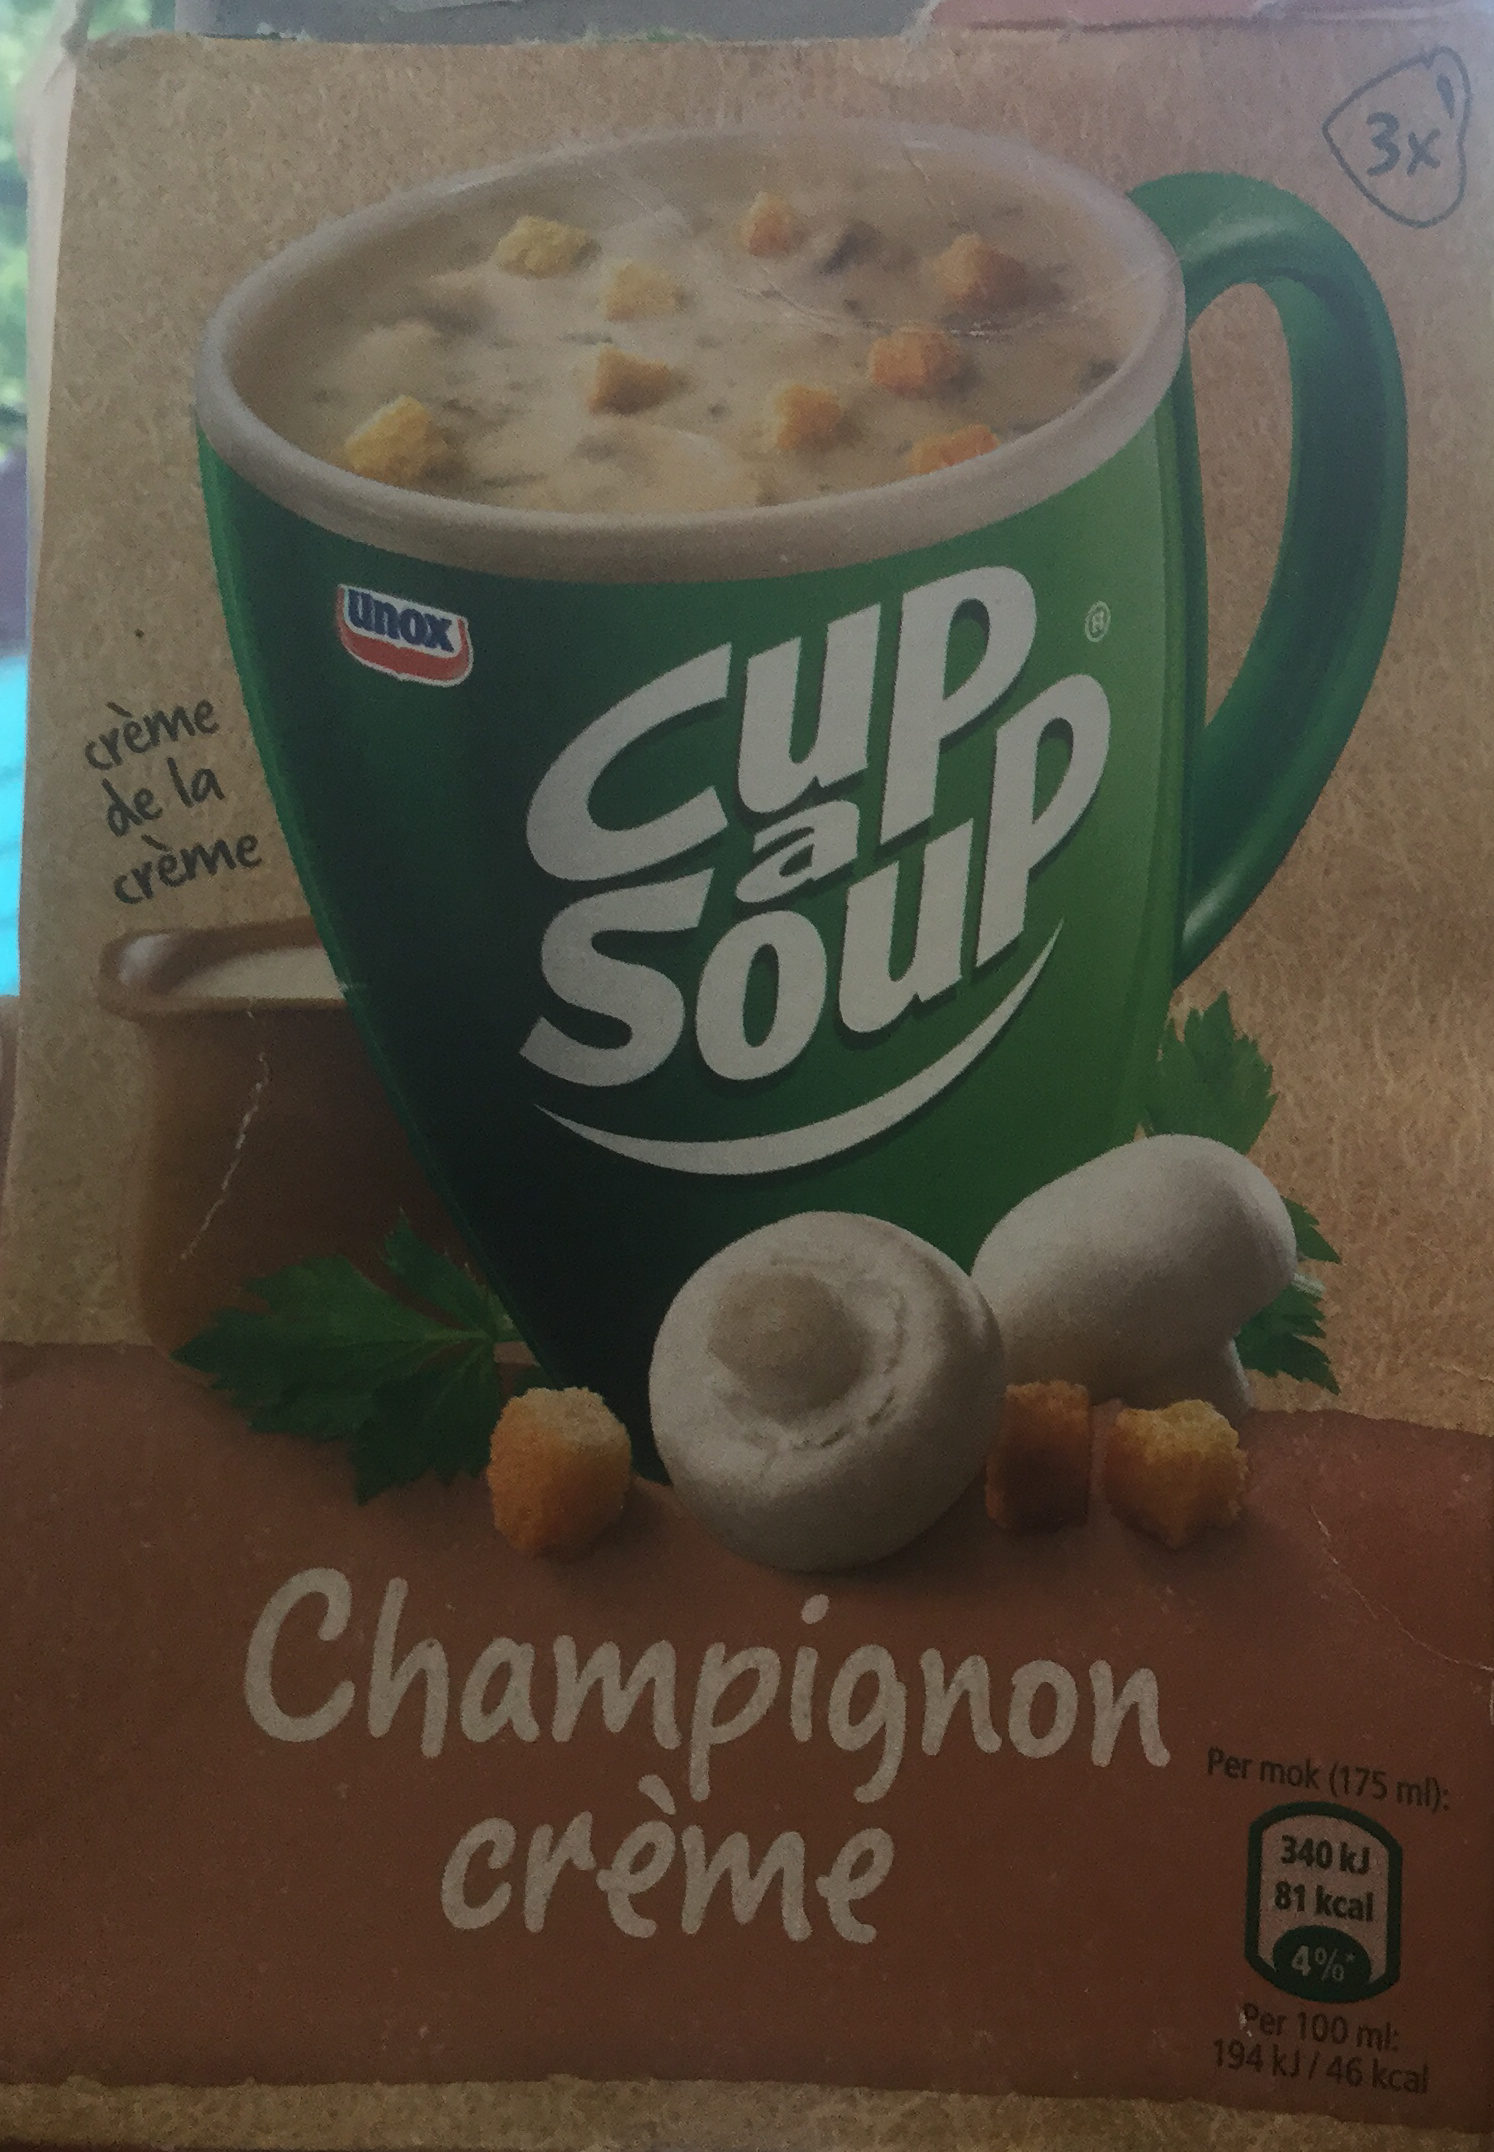 Champignon creme - Product